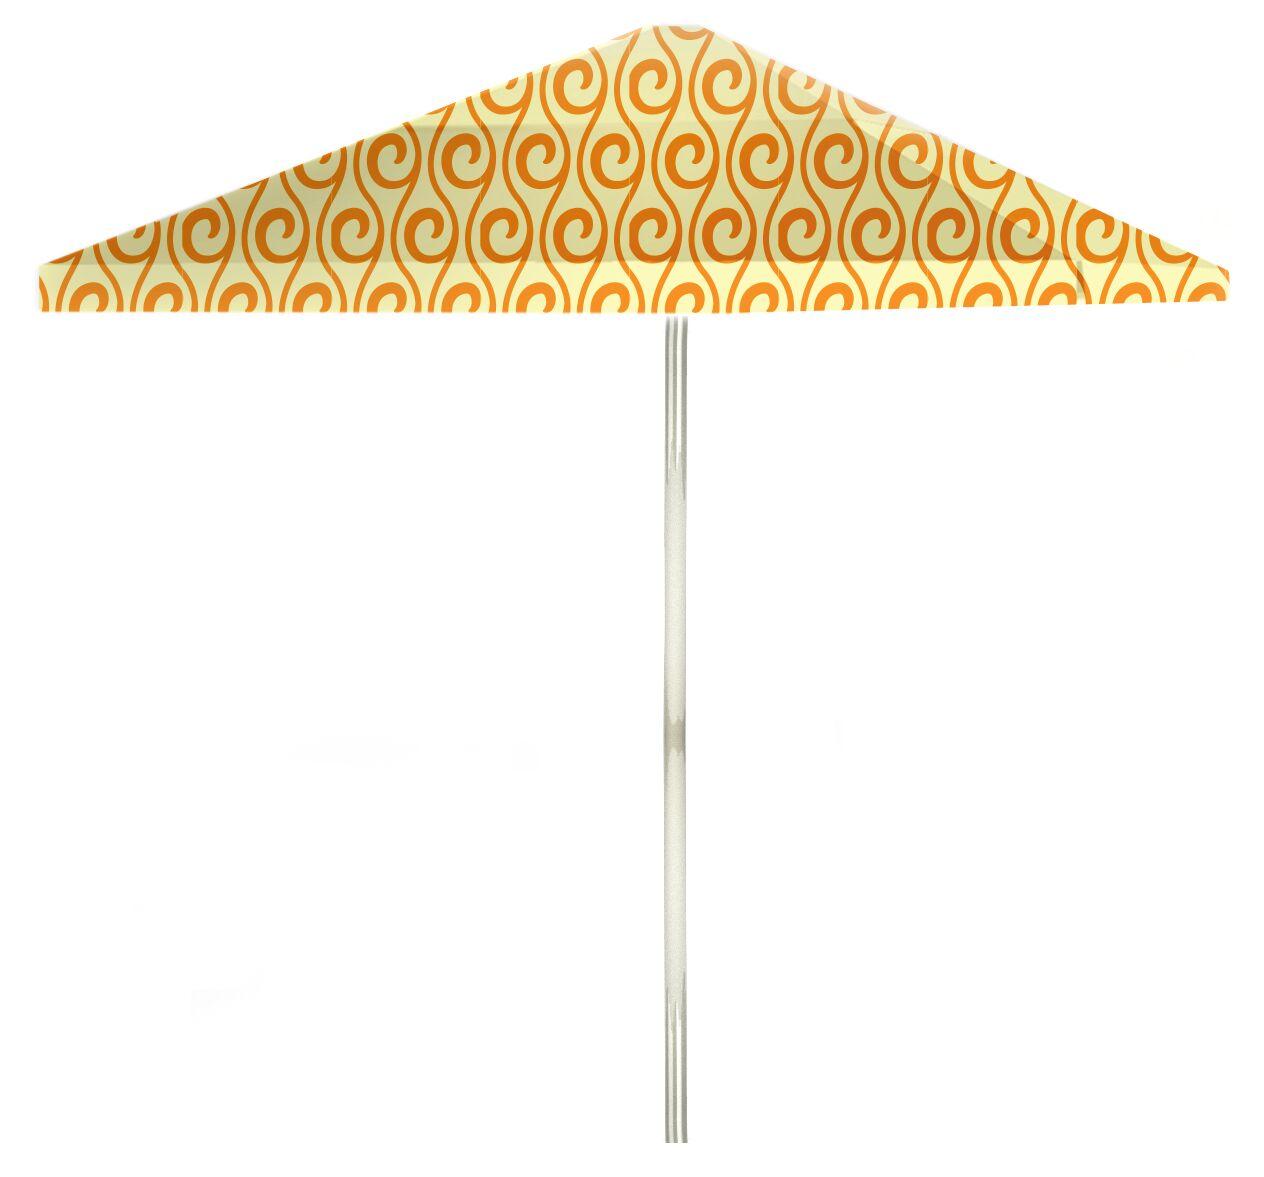 6' Square Market Umbrella Color: Toasted Sunshine